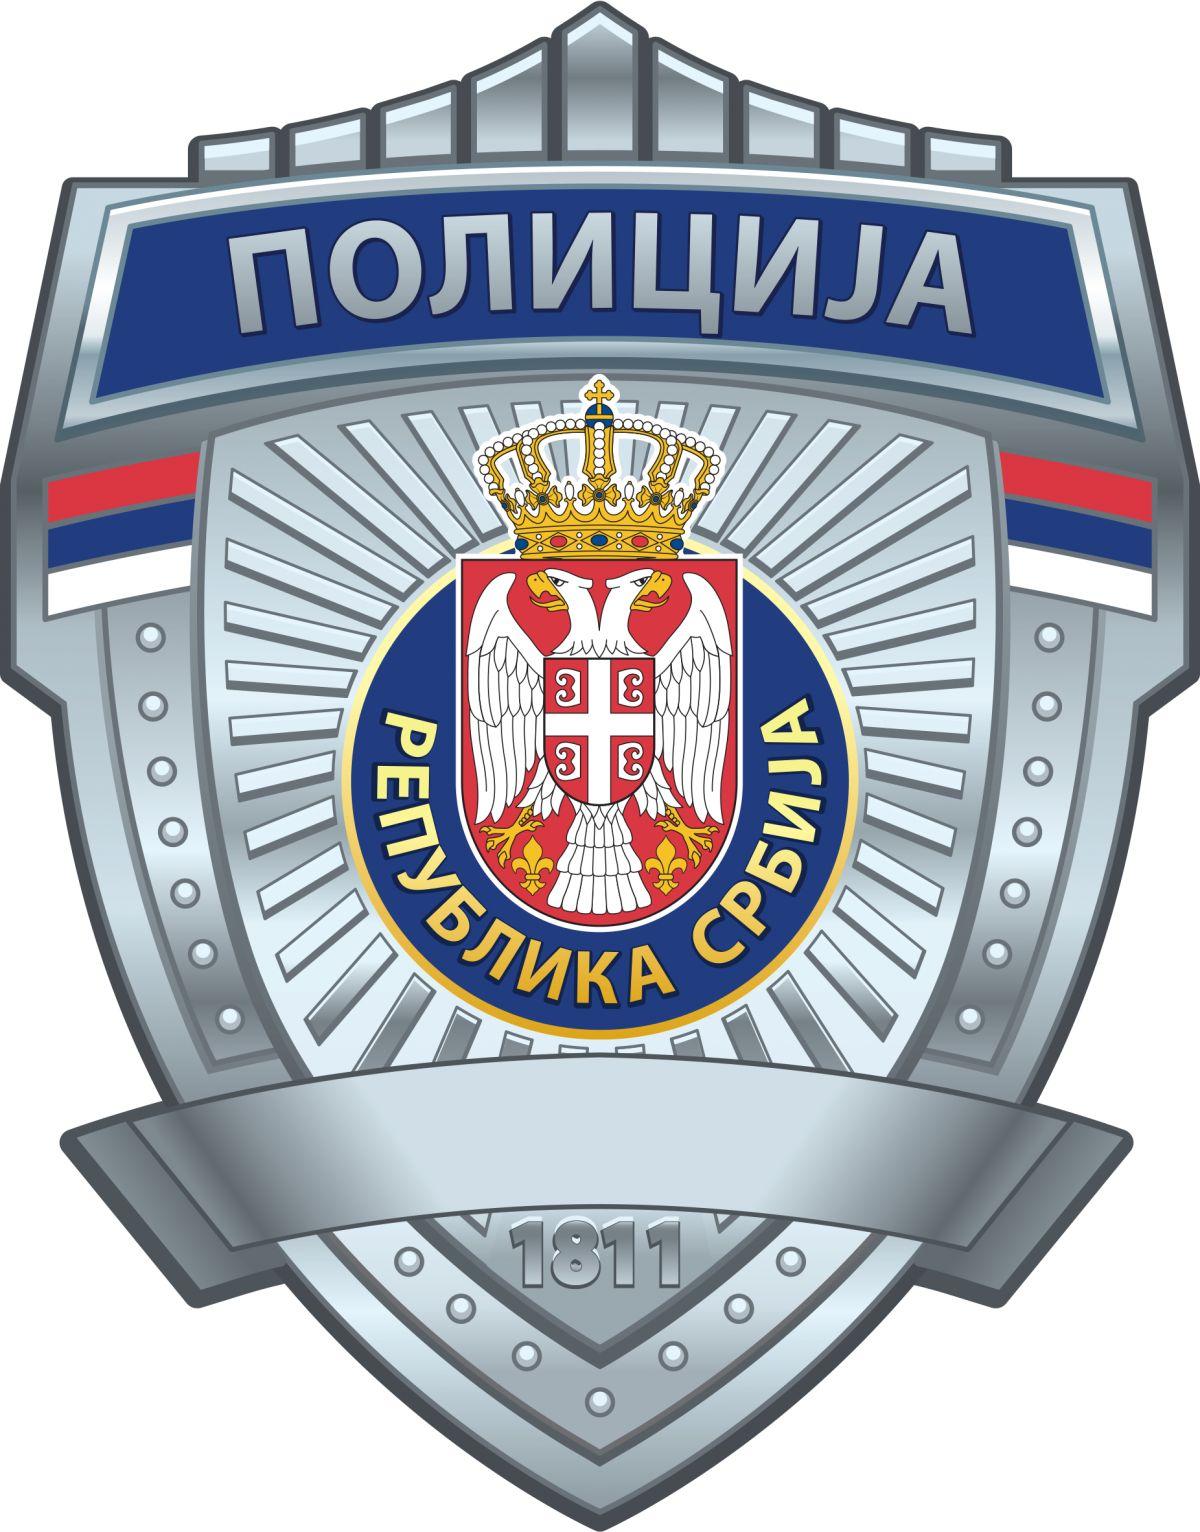 Šapčanin uhapšen u Gornjem Milanovcu